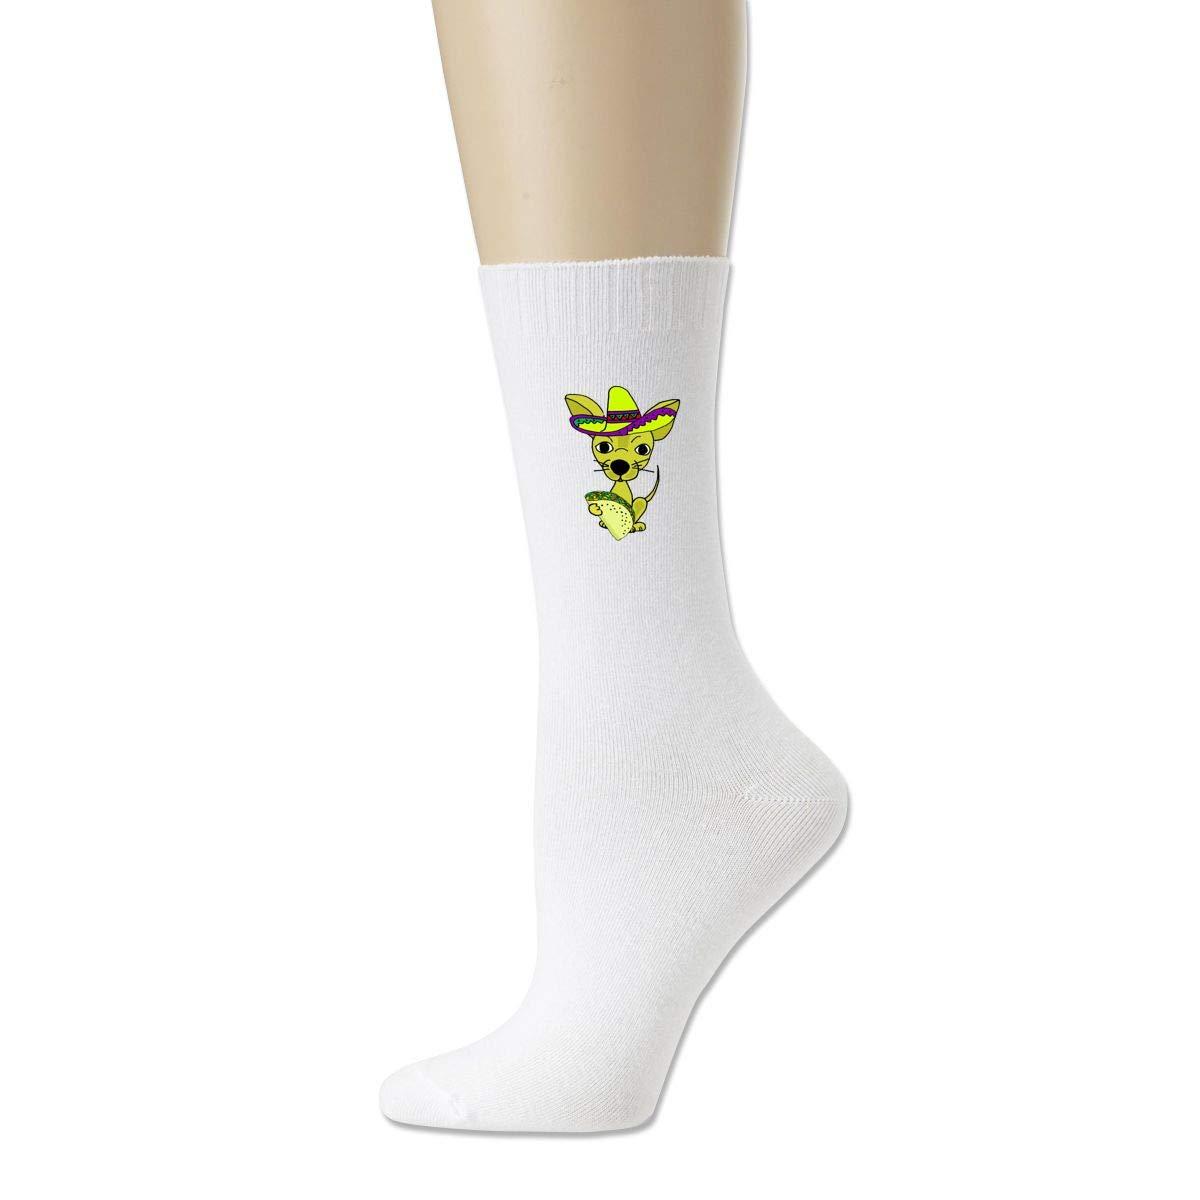 Rigg-socks Chihuahua Dog Eating Taco Mens Comfortable Sport Socks Black